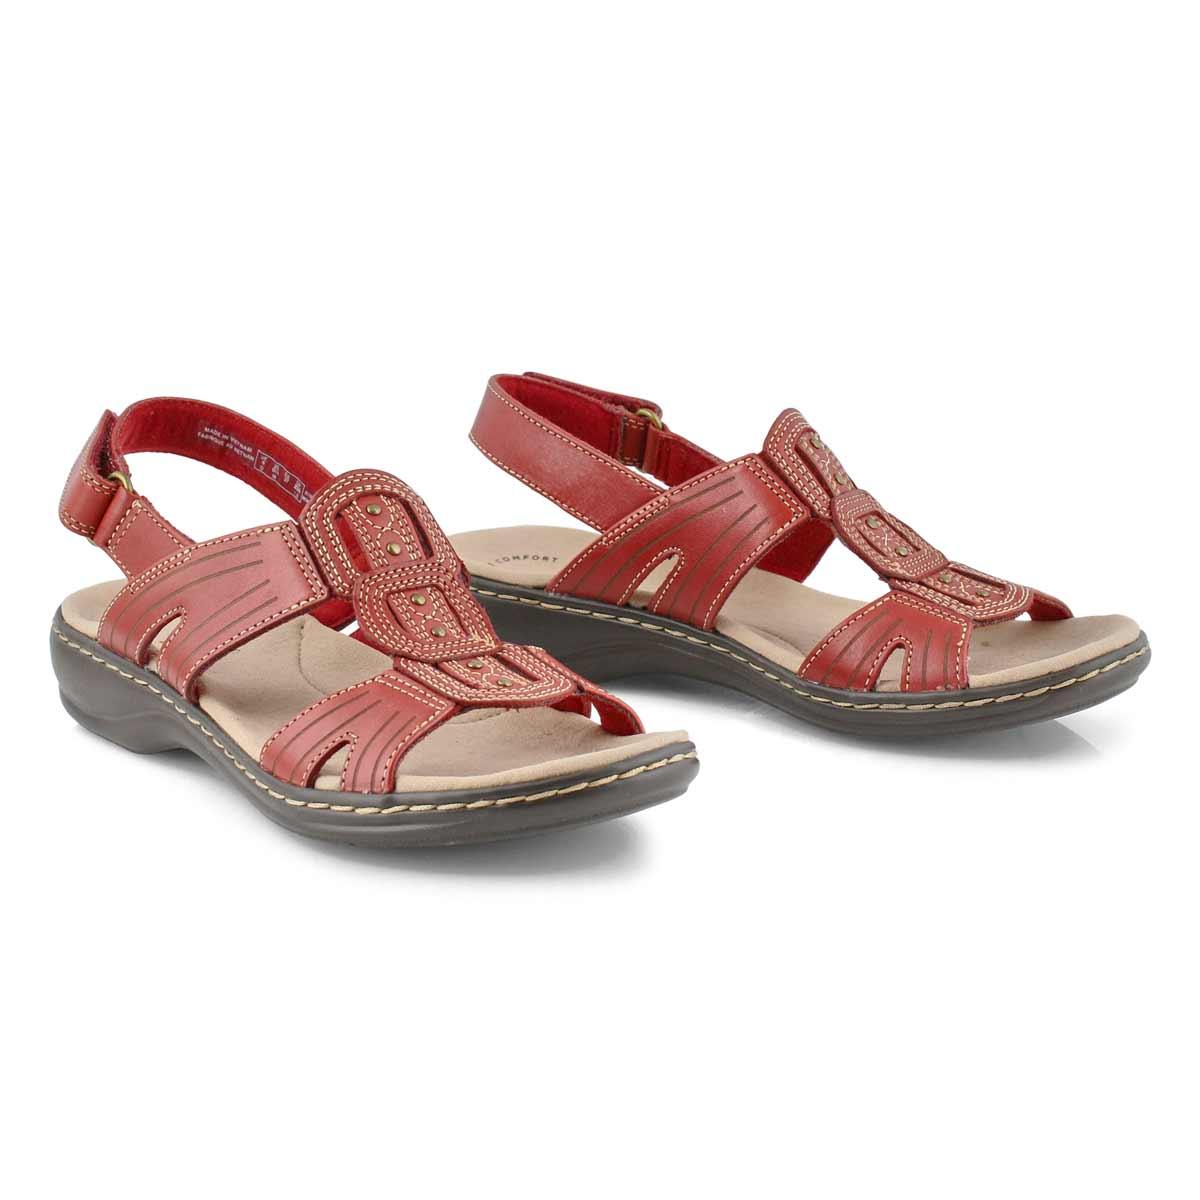 Lds Leisa Vine red casual sandal